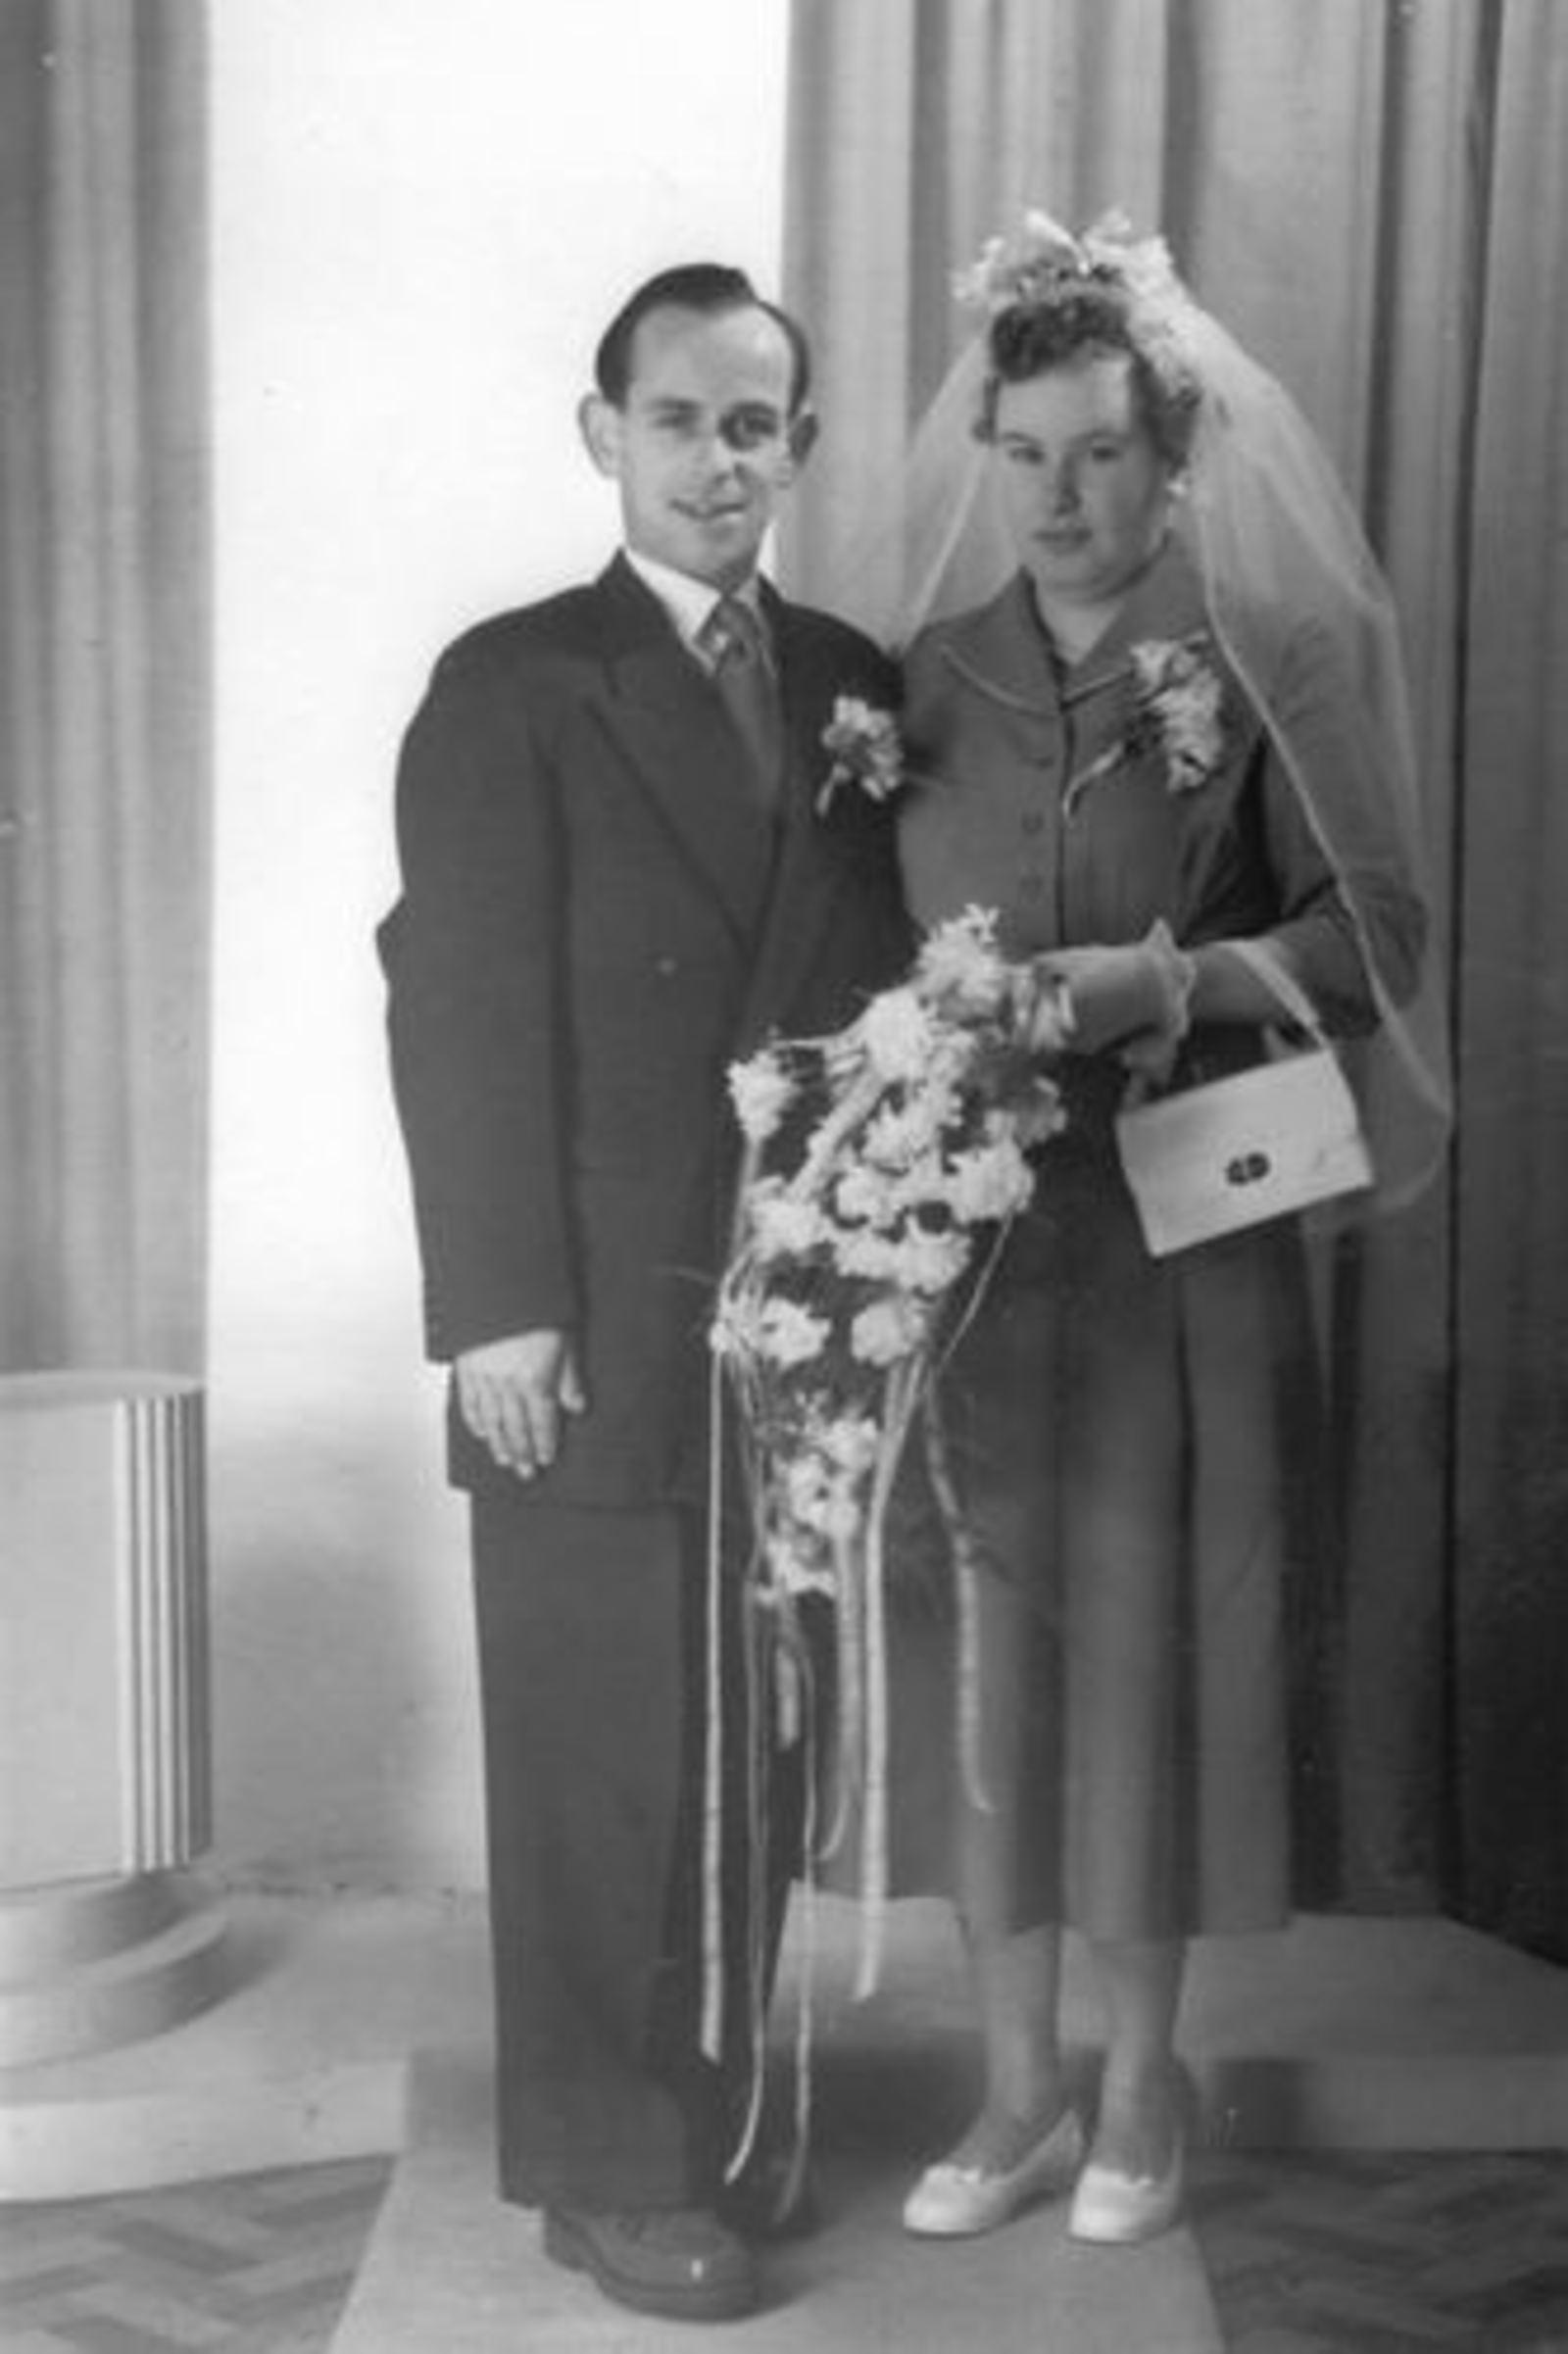 Robijn Cees 1928 19__ trouwt Jana v Kuijk